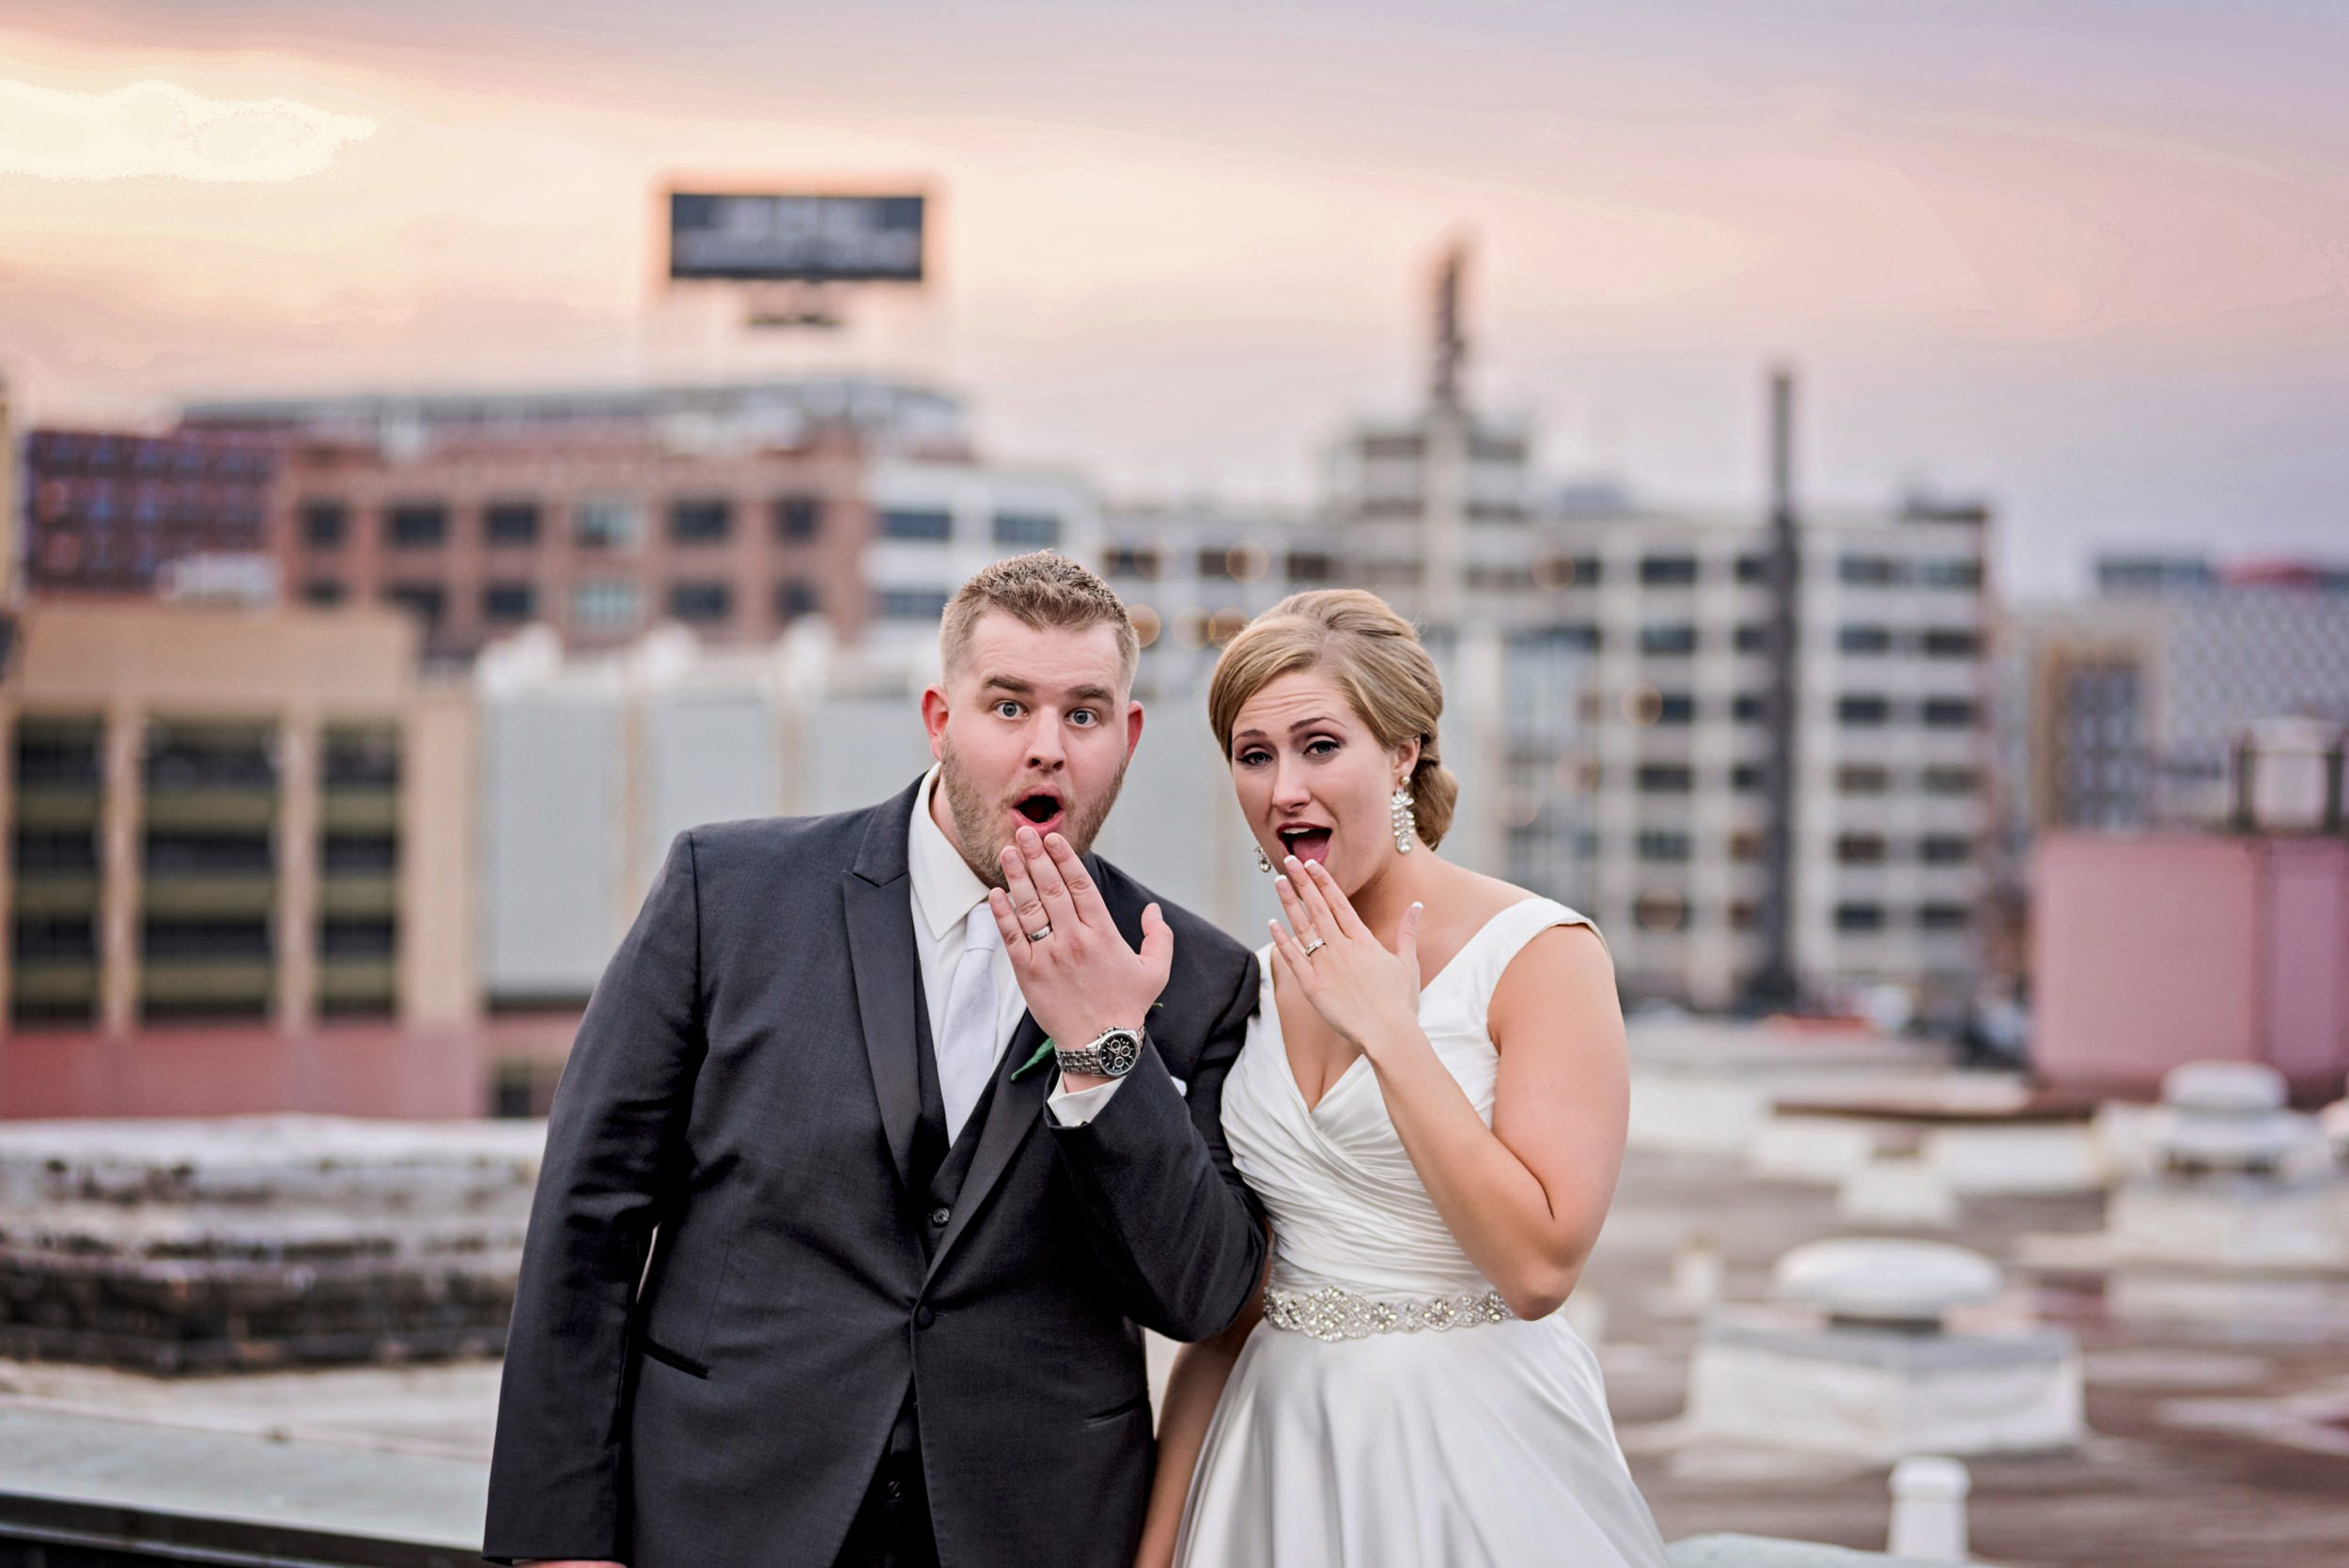 2018-Real-Wedding-Megan-Brenden-Rotella-Photography_0422.jpg